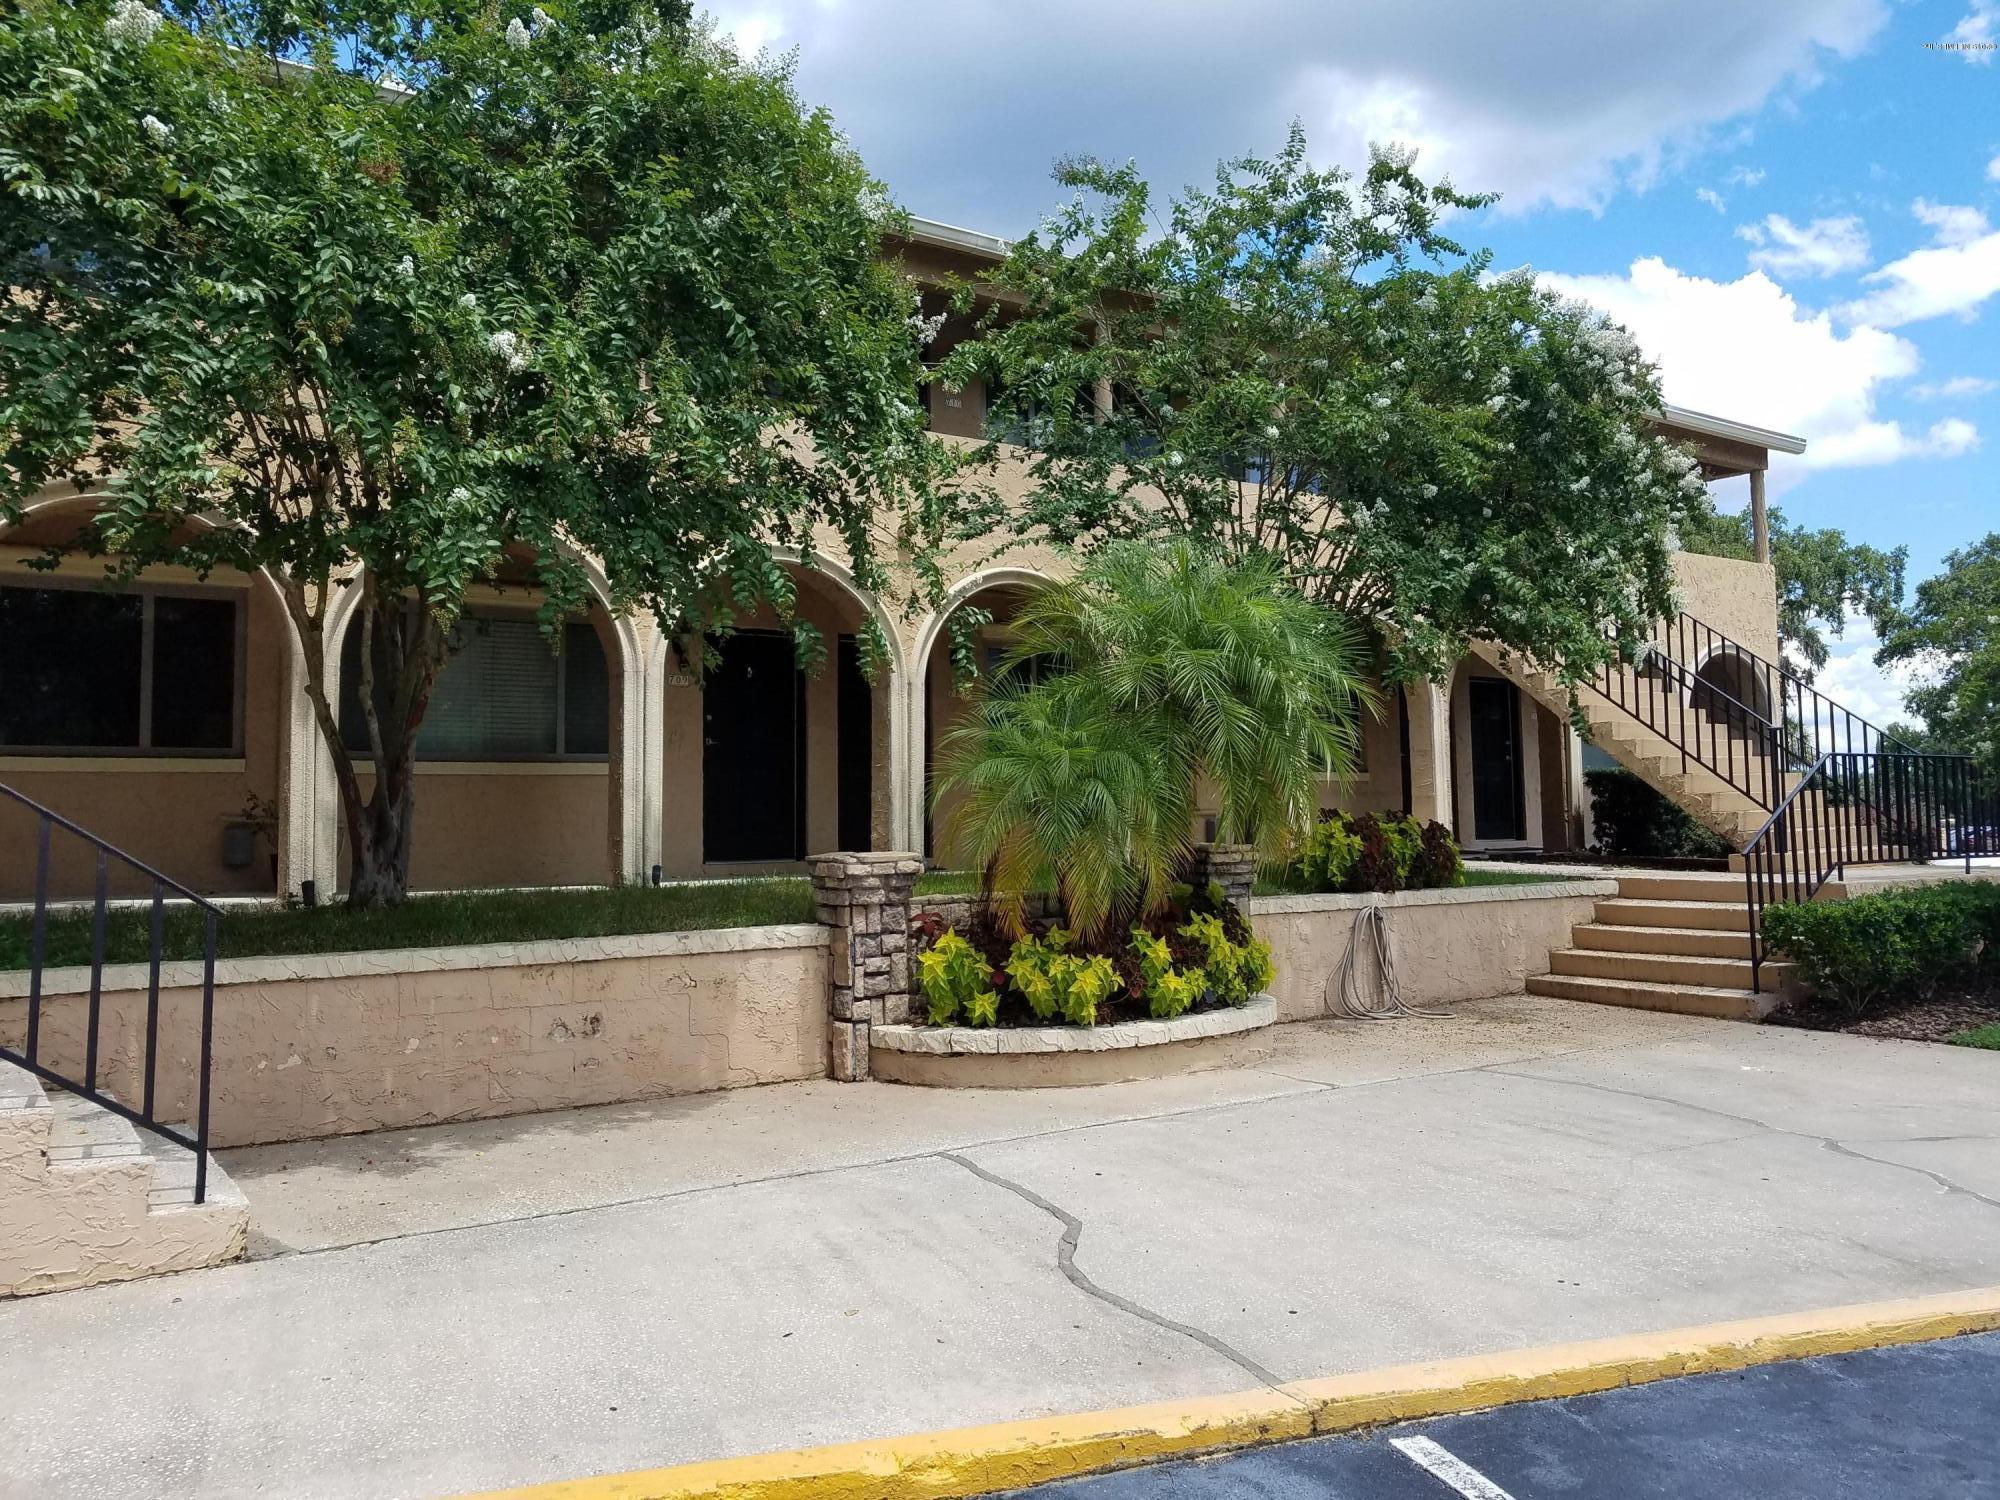 5375 ORTEGA FARMS, JACKSONVILLE, FLORIDA 32210, 2 Bedrooms Bedrooms, ,2 BathroomsBathrooms,Residential - condos/townhomes,For sale,ORTEGA FARMS,1009156